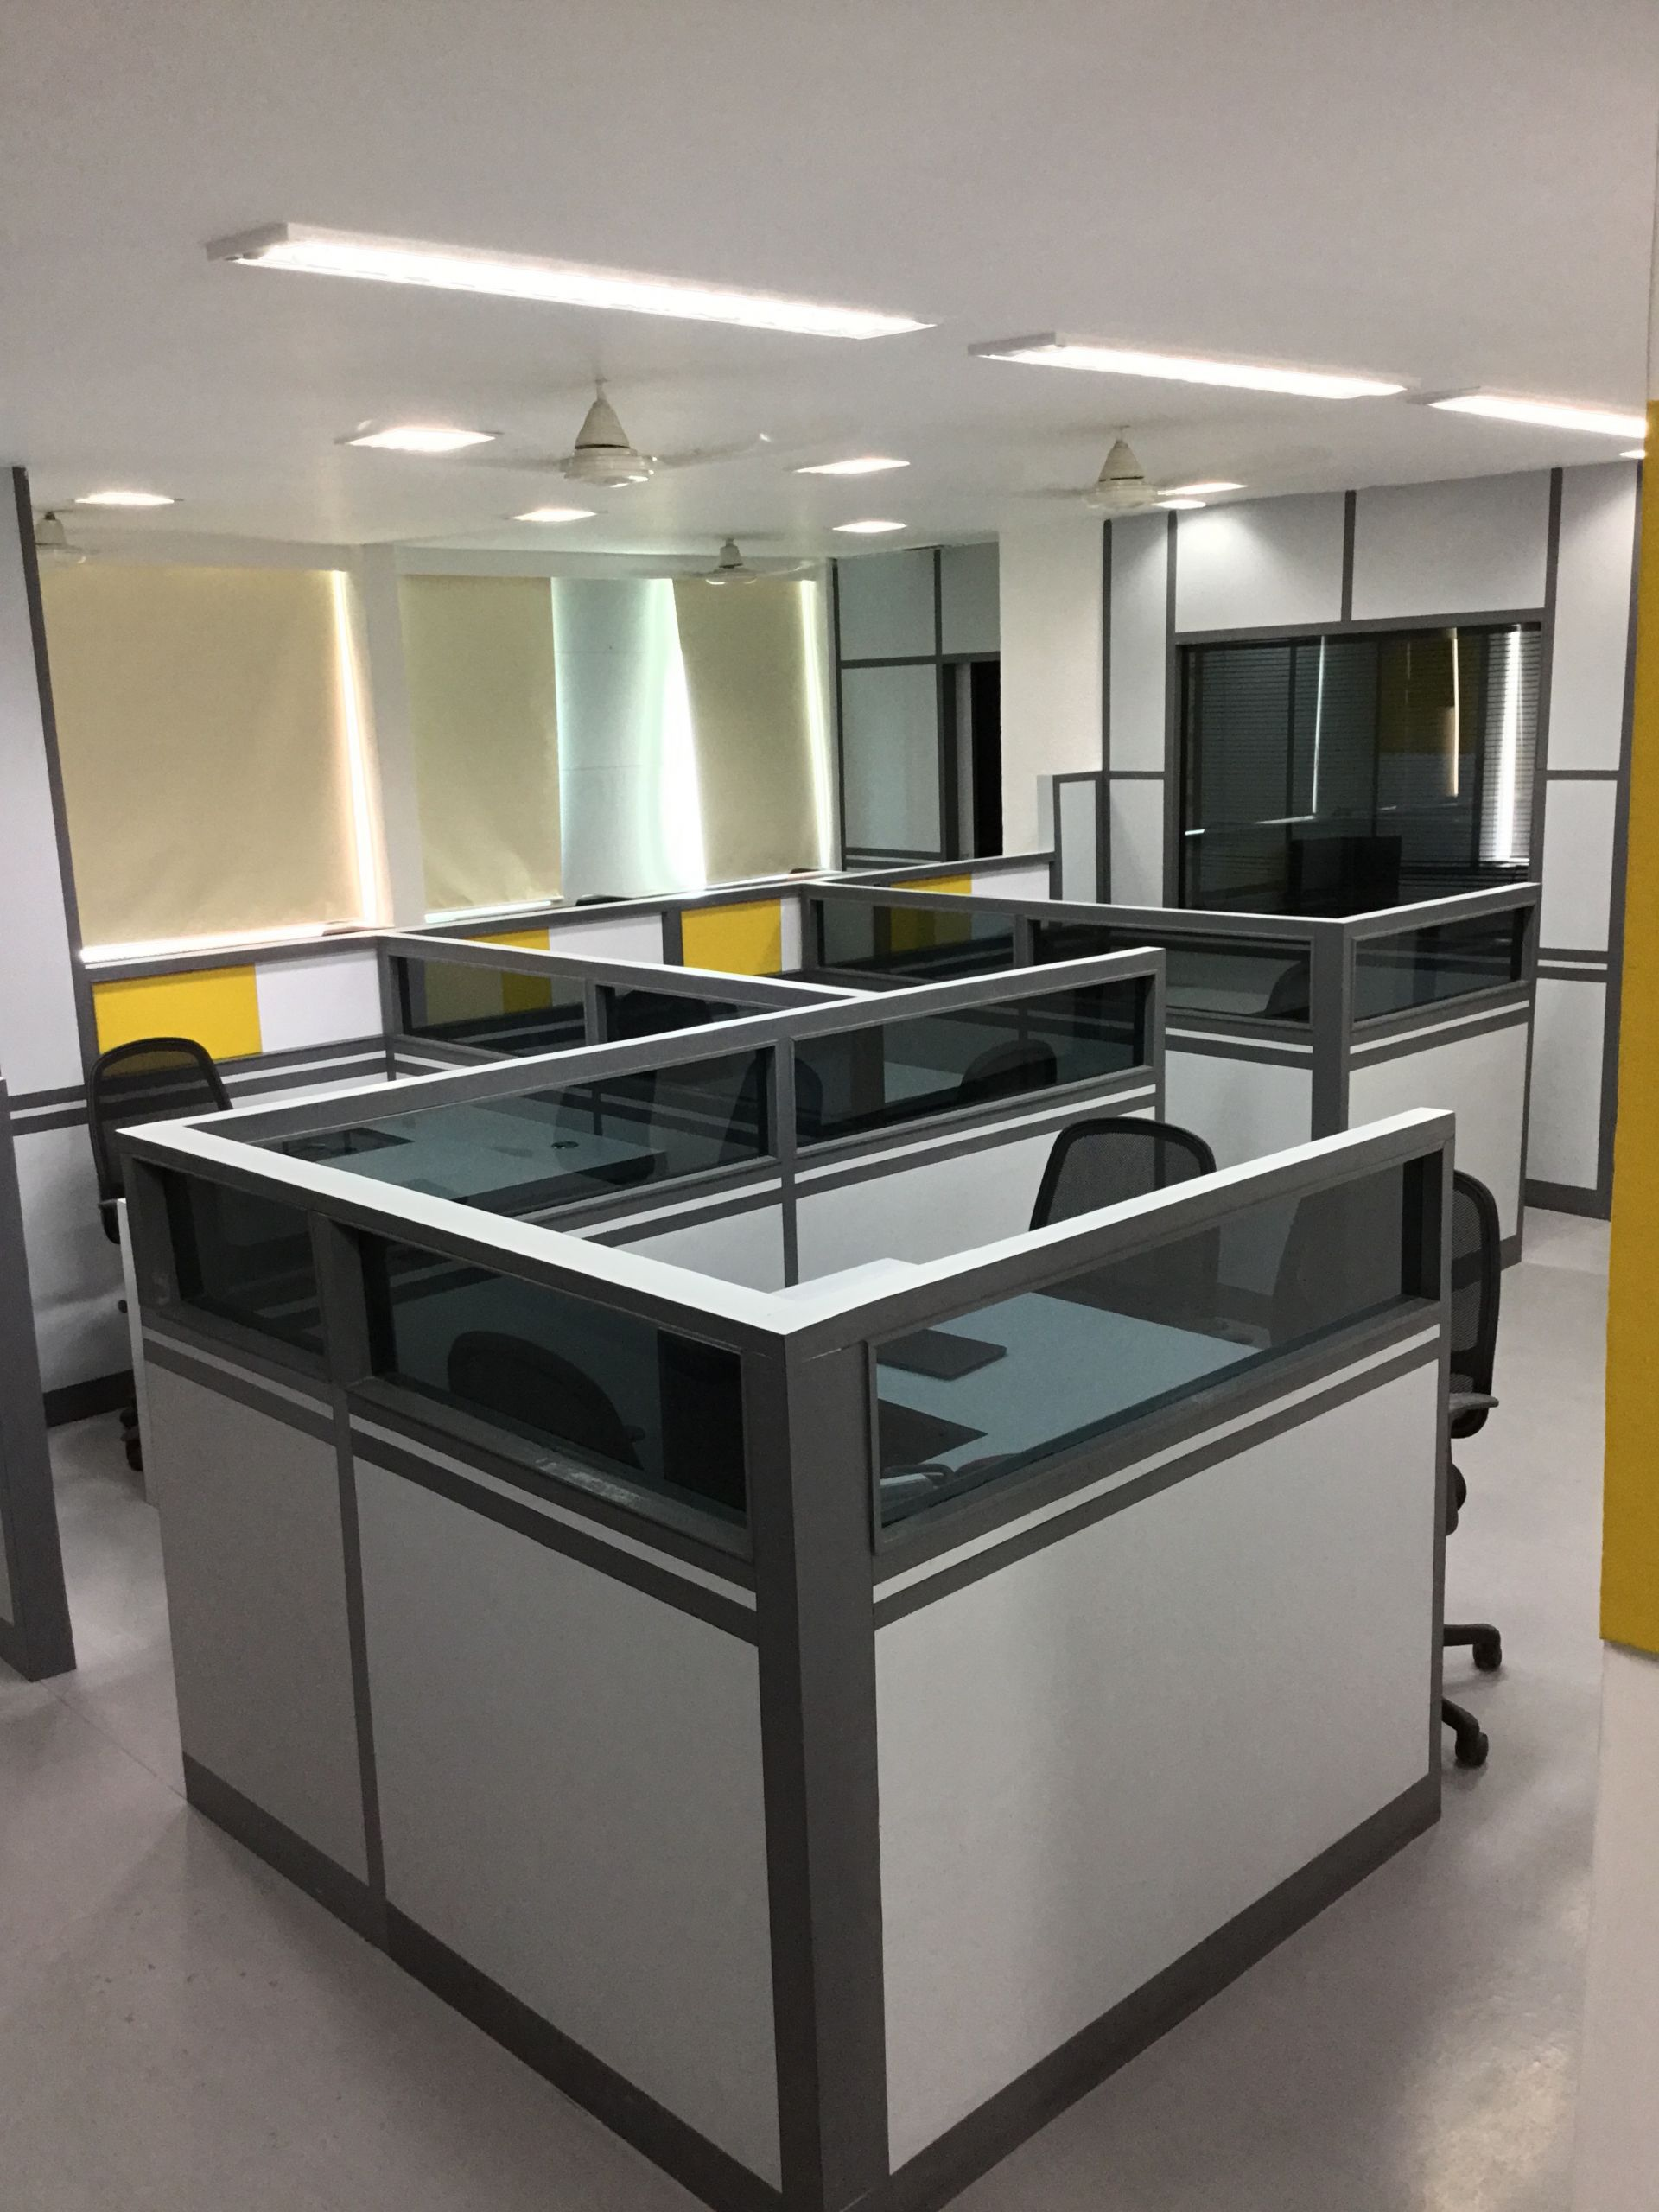 Studio CoWork, Kolkata